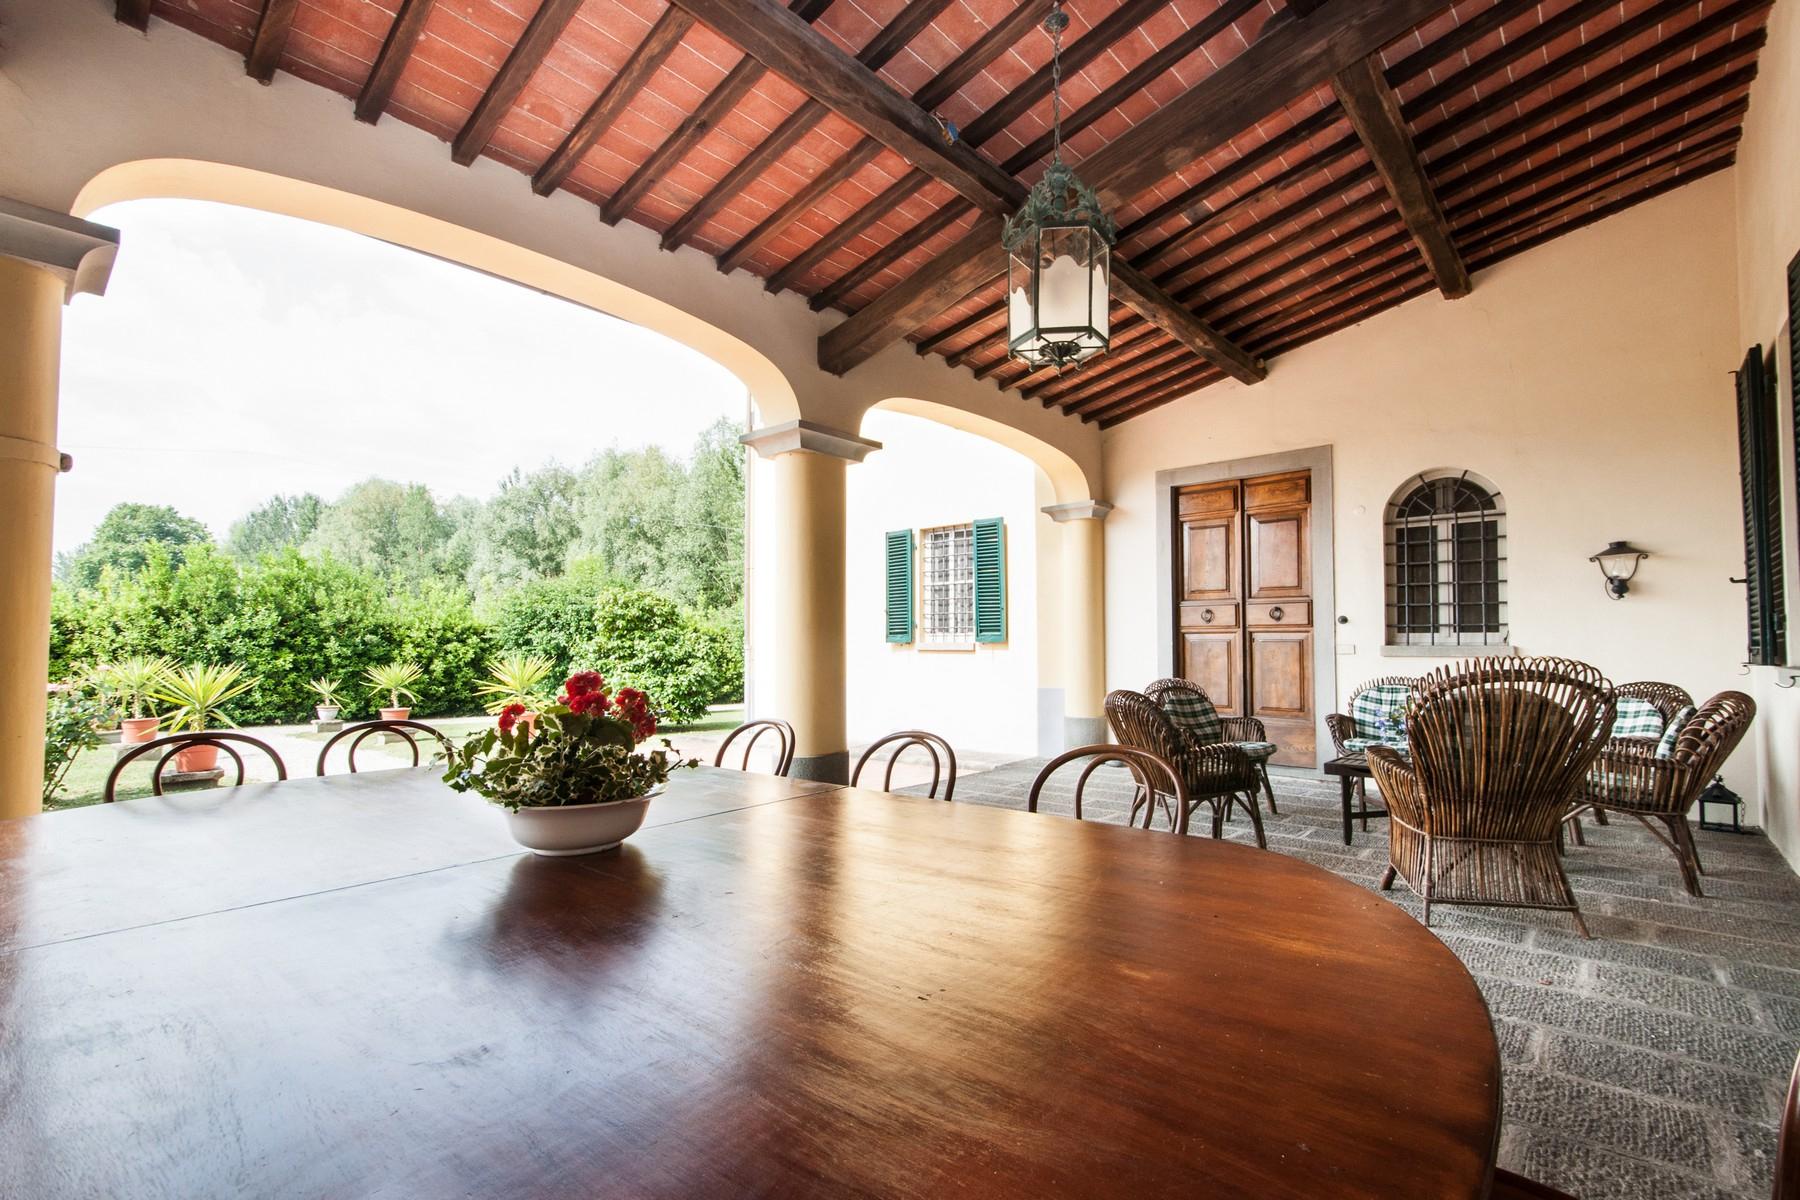 Villa in Vendita a Lucca: 5 locali, 400 mq - Foto 3